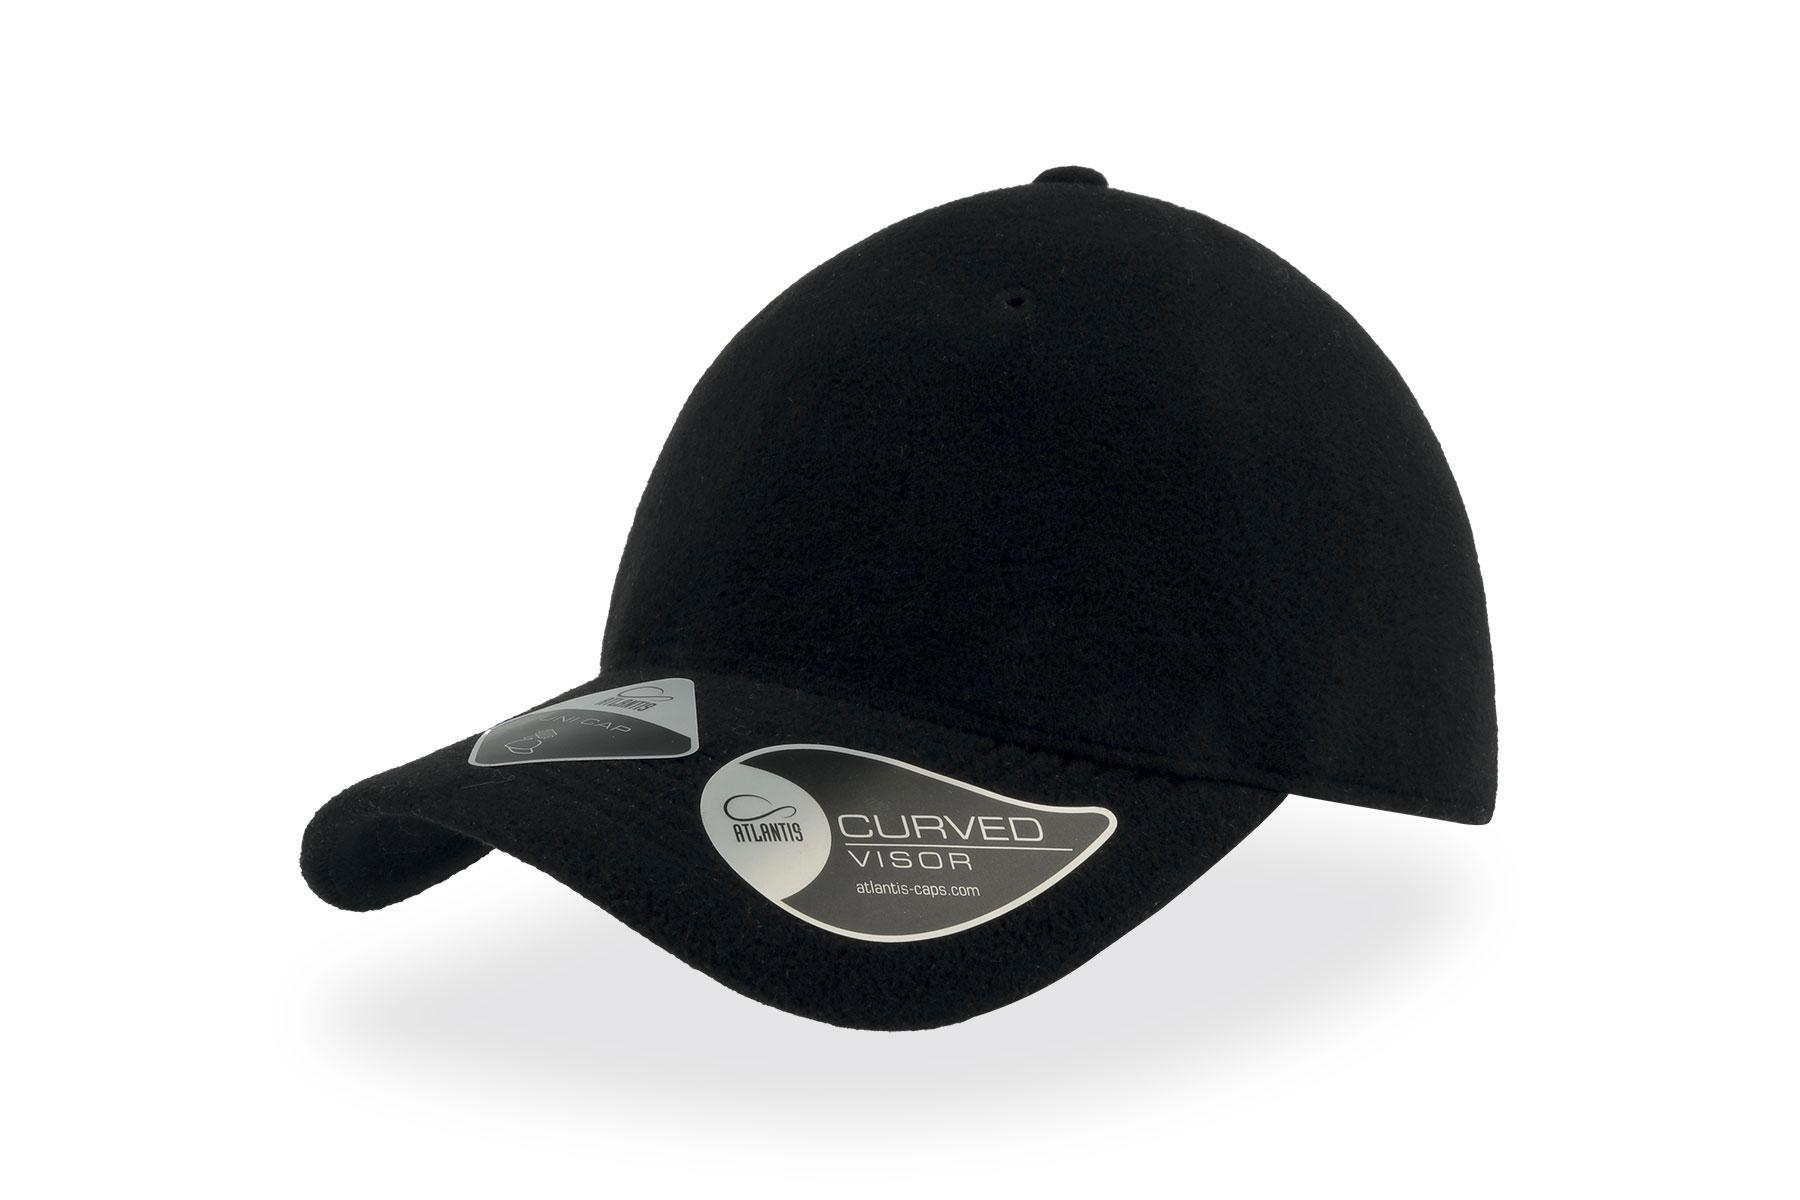 Uni-Cap Polarfleece -lippis - NEW 2019 ATLANTIS CAPS & HATS - UNPO - 2